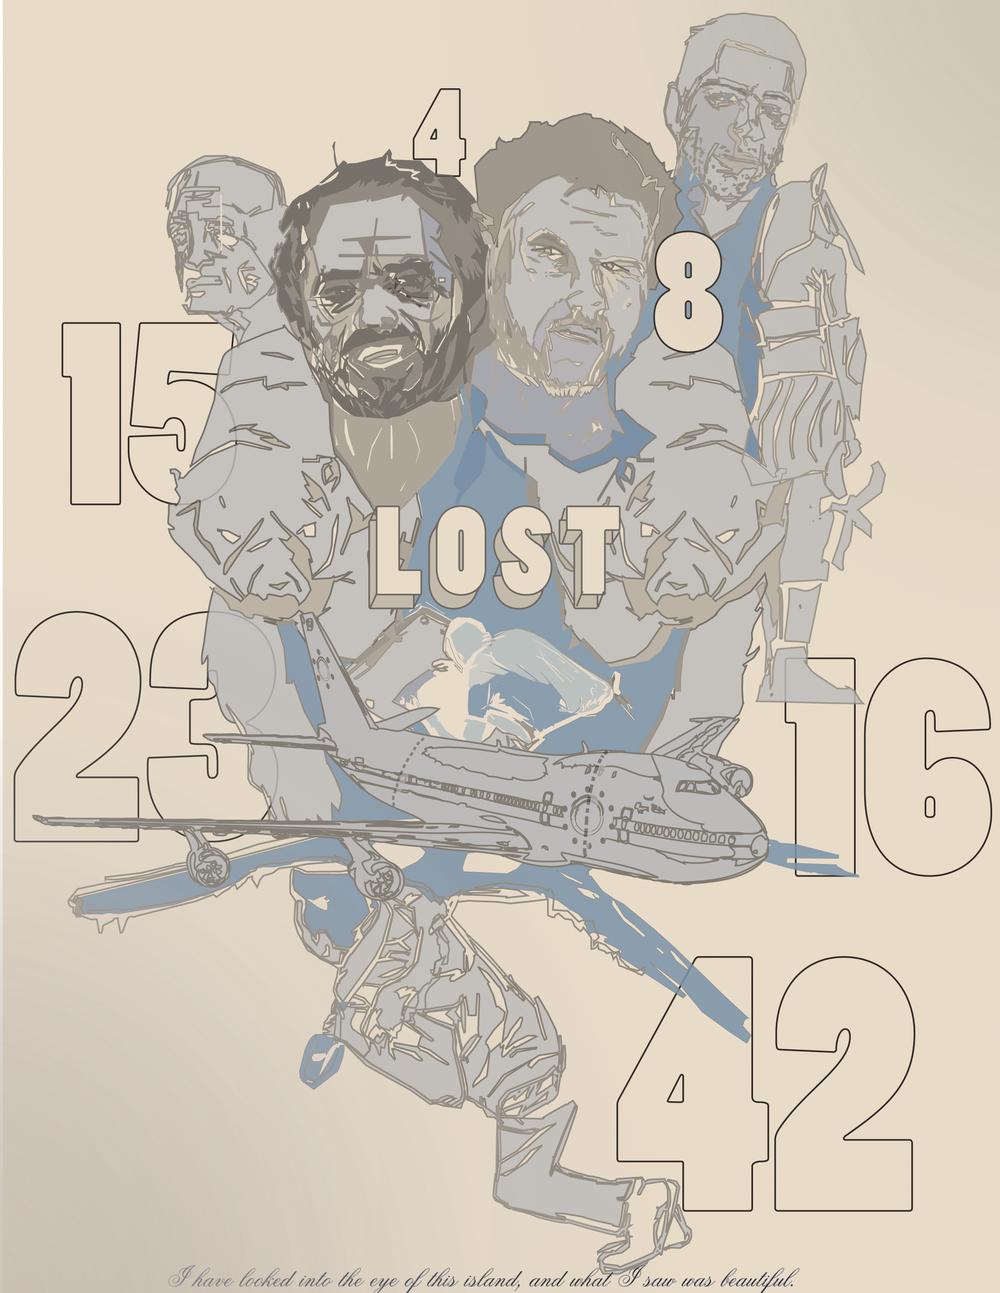 losts.jpg